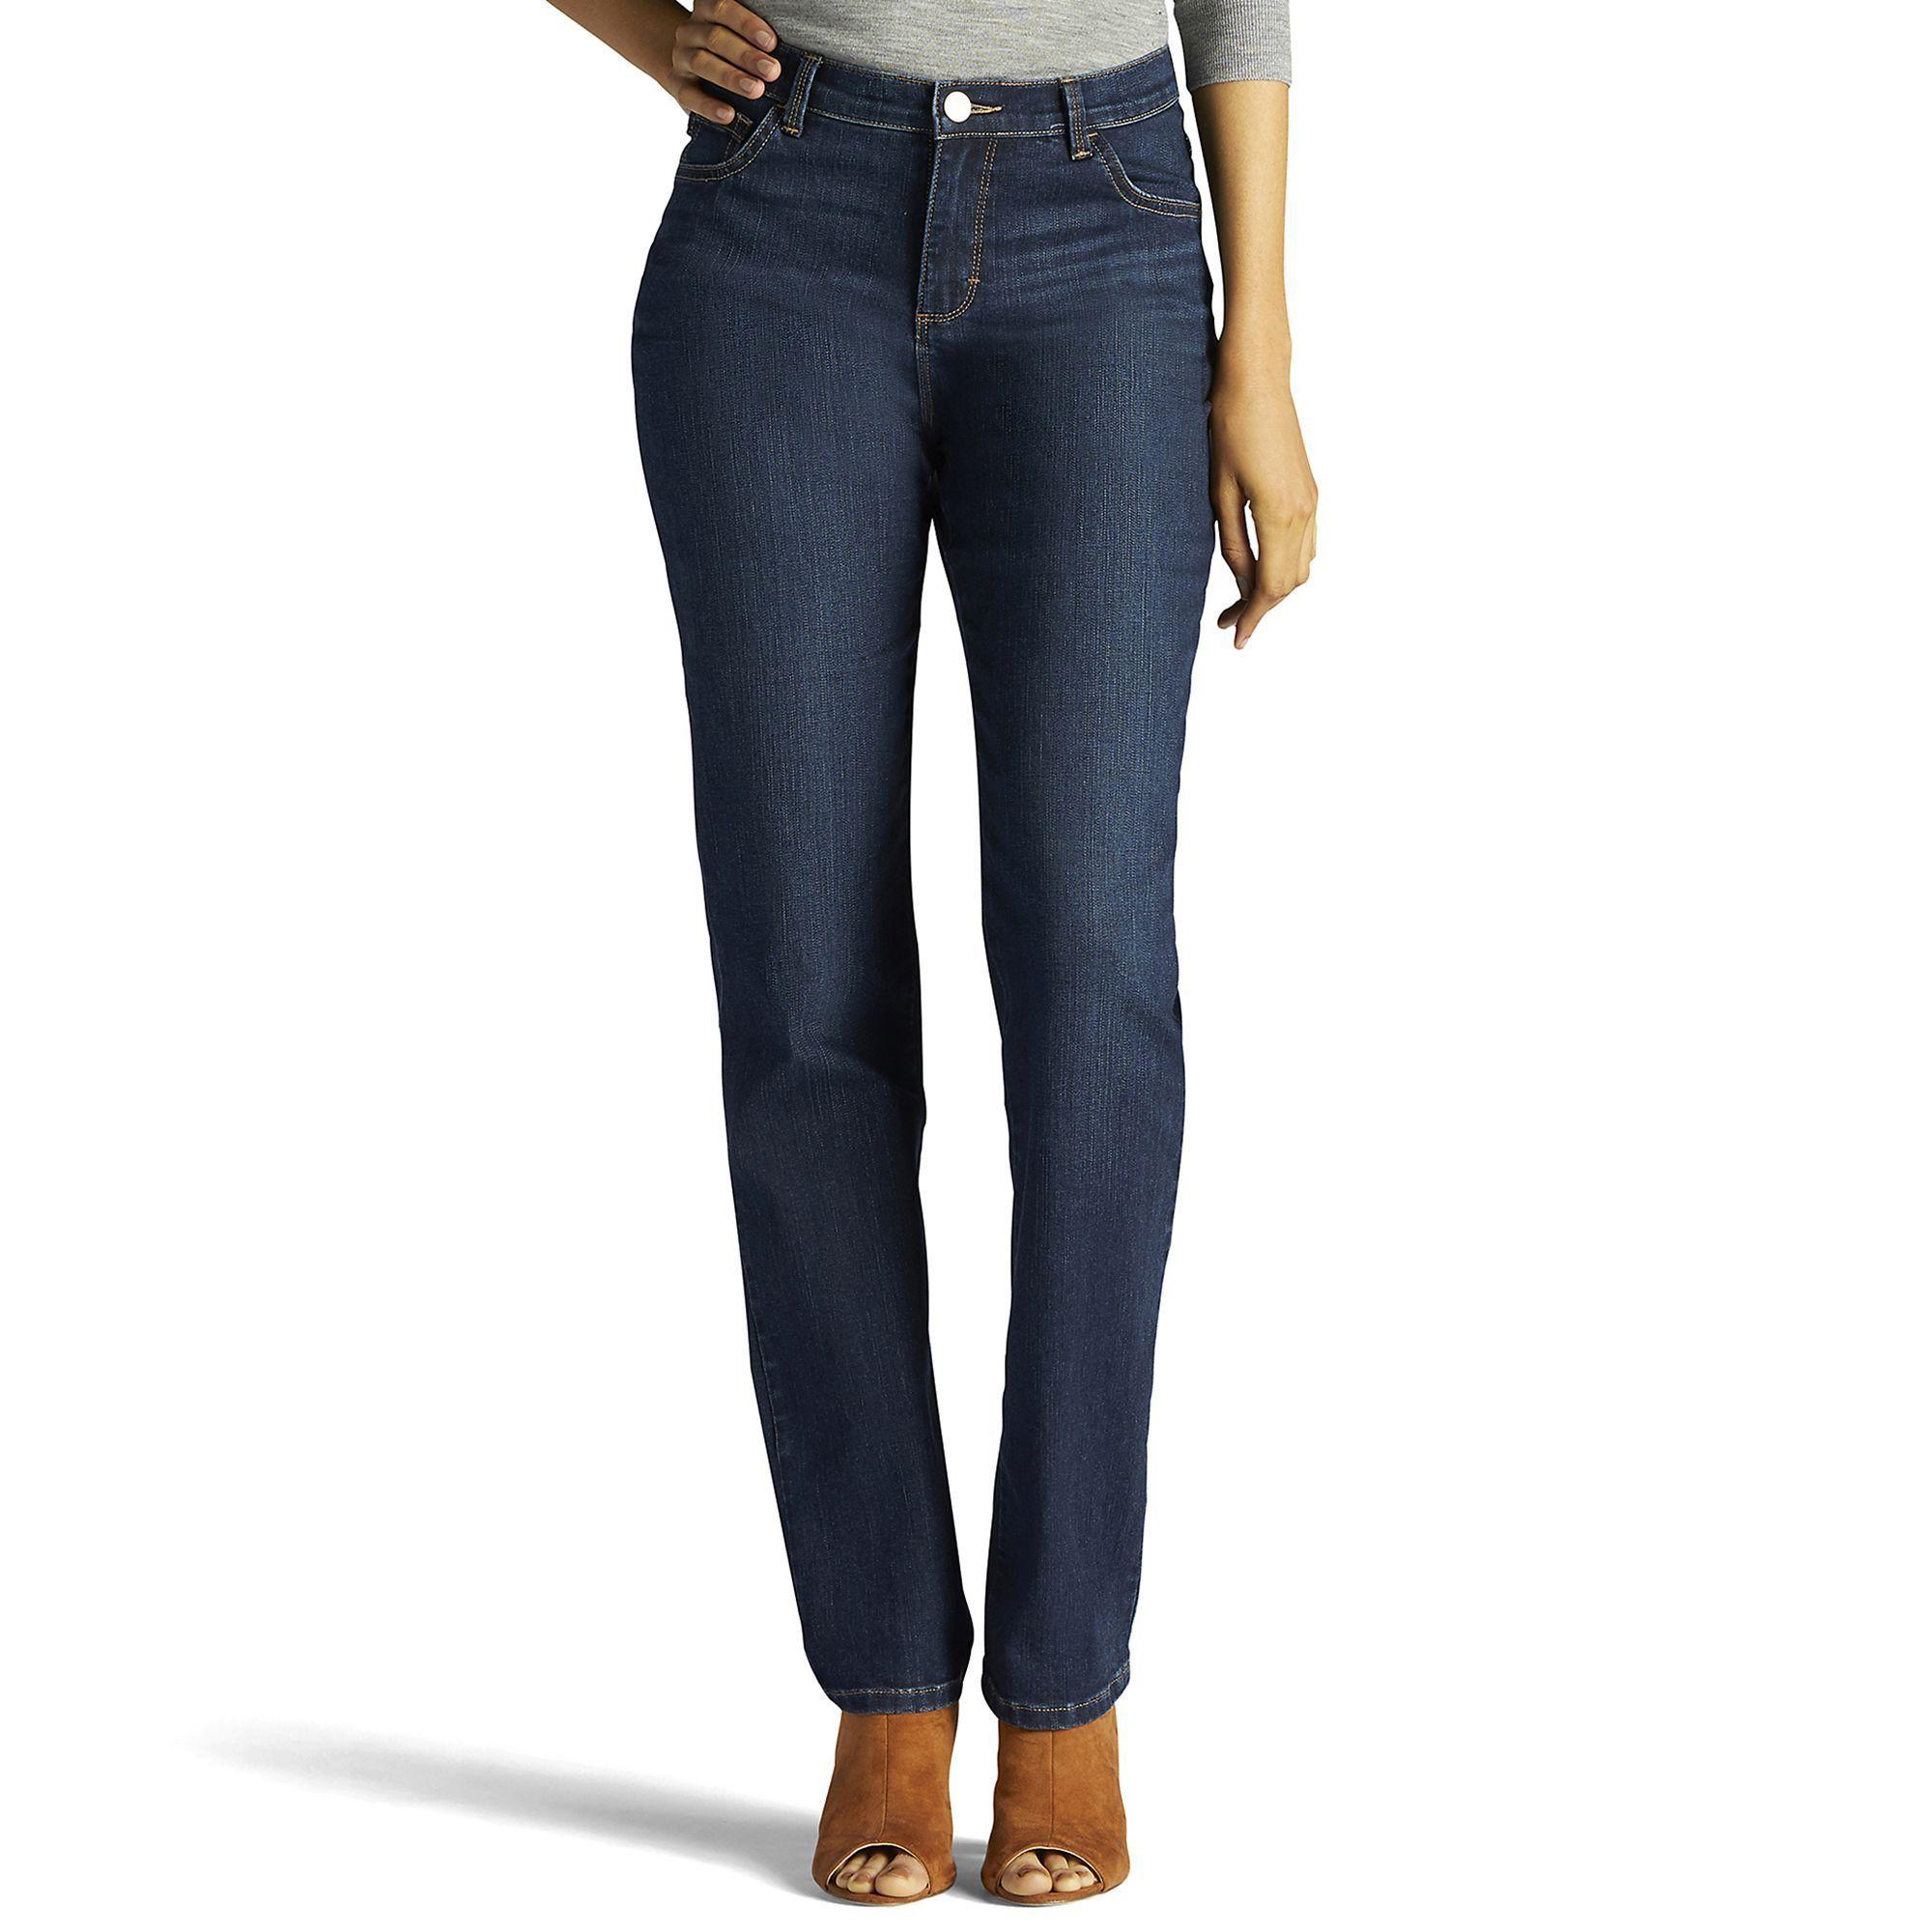 Hepburn petite jeans, tube amateur teen